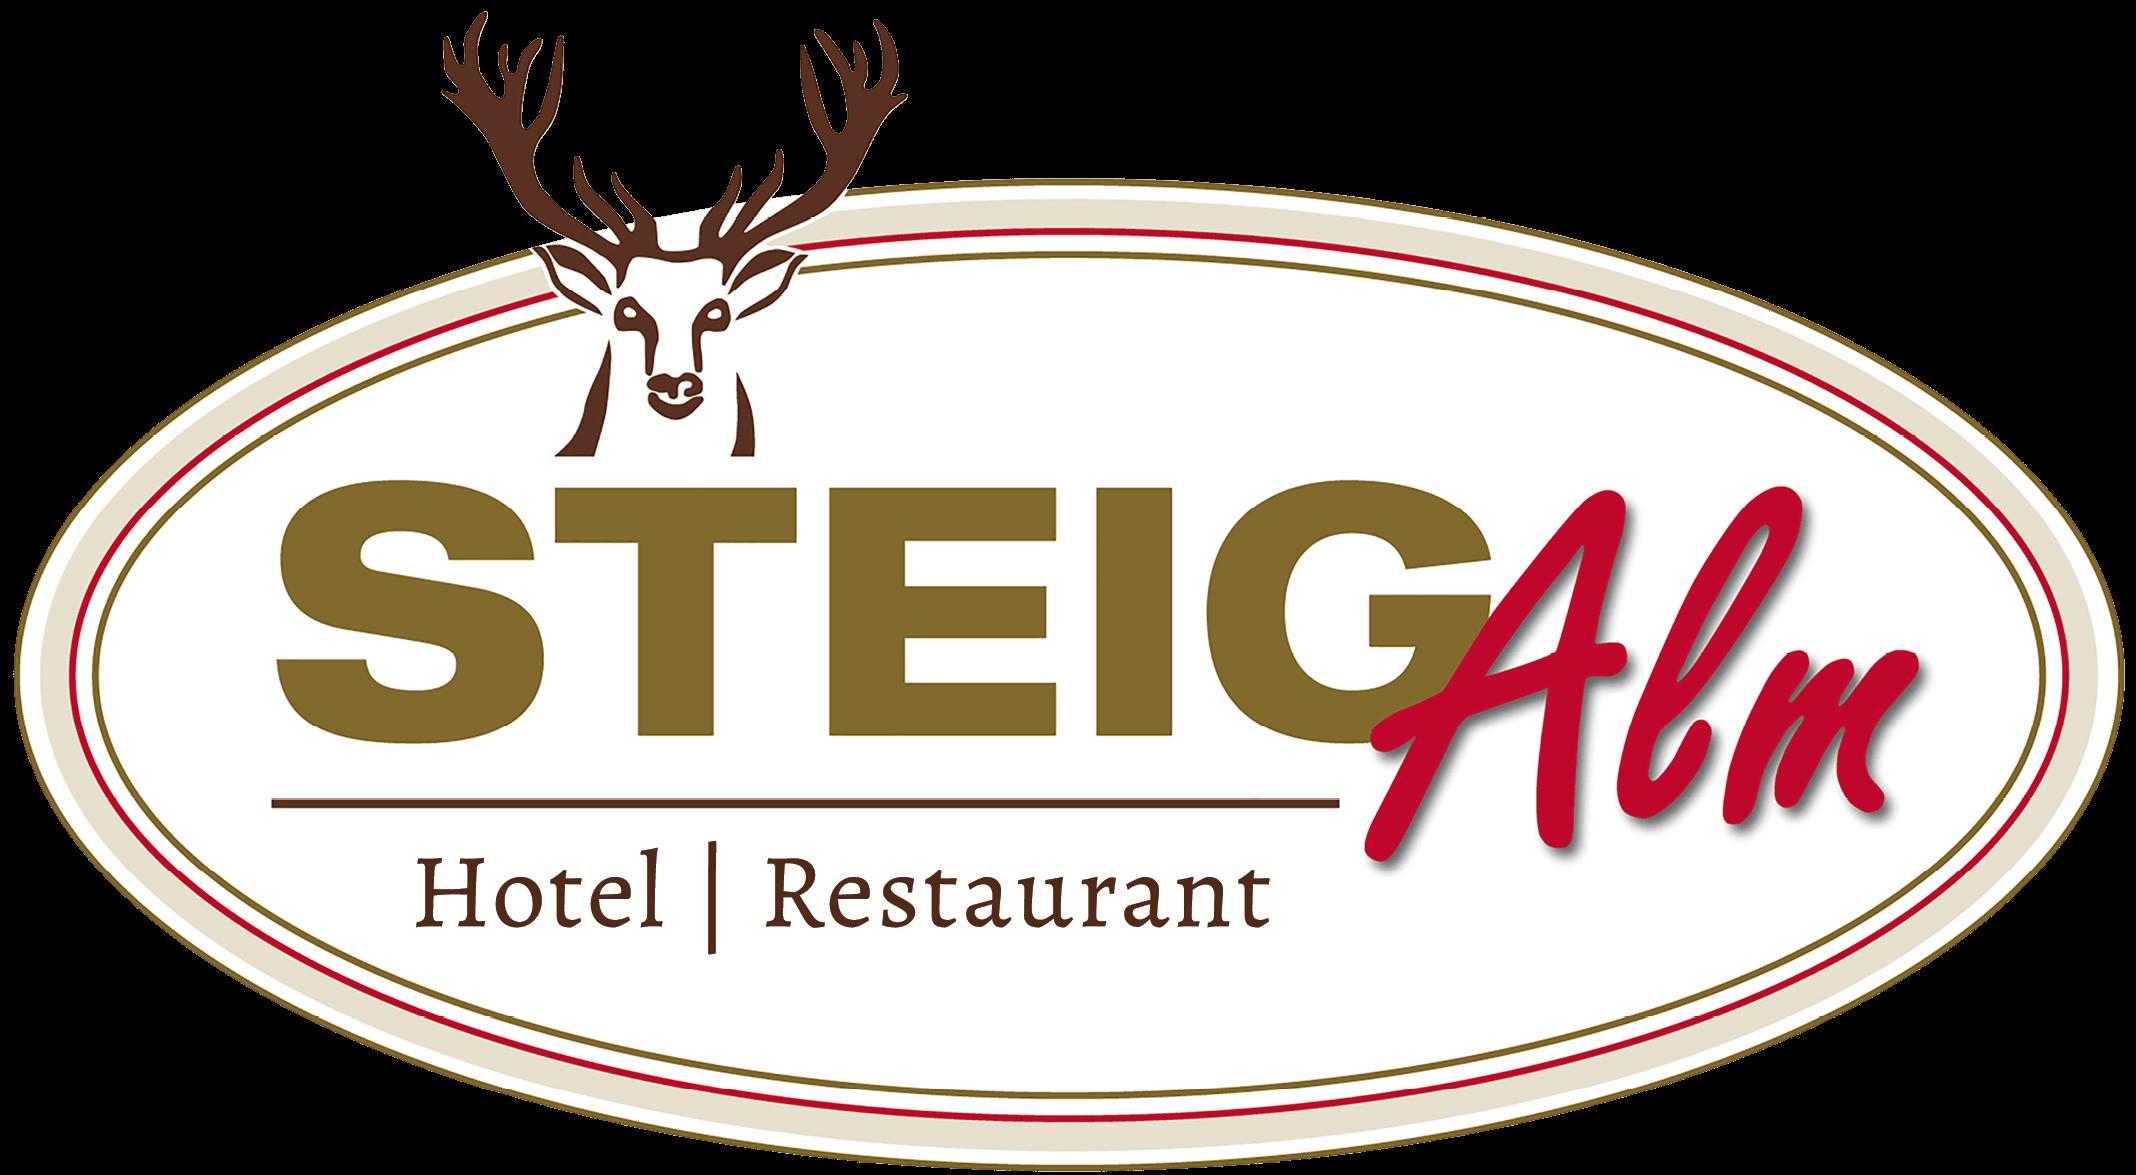 Steigalm I Hotel – Restaurant